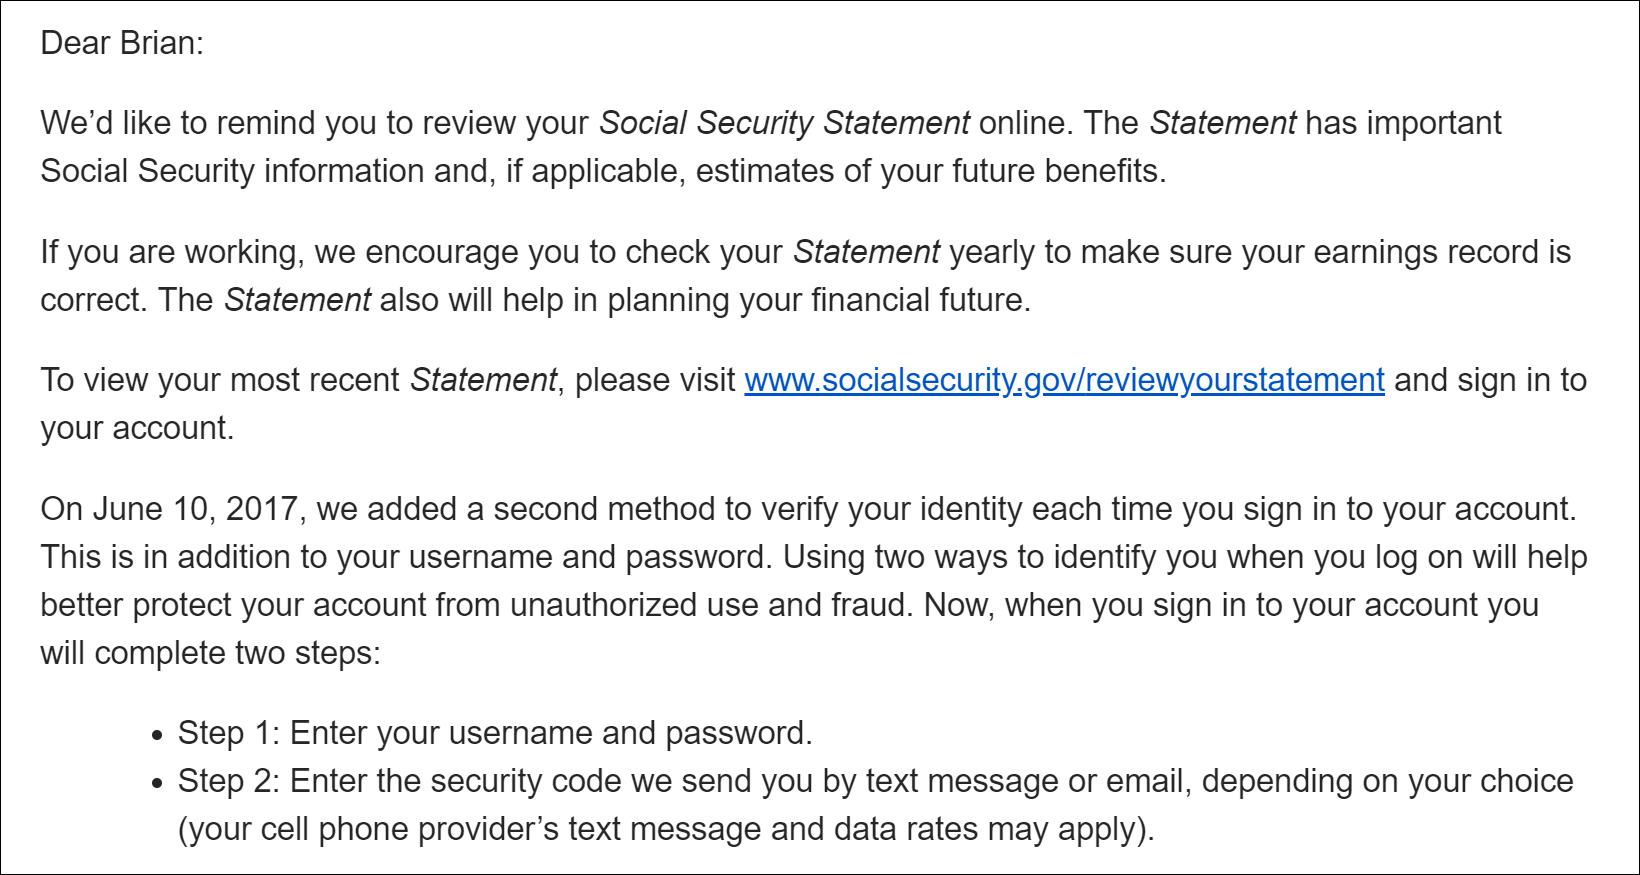 Social Security Reminder.png